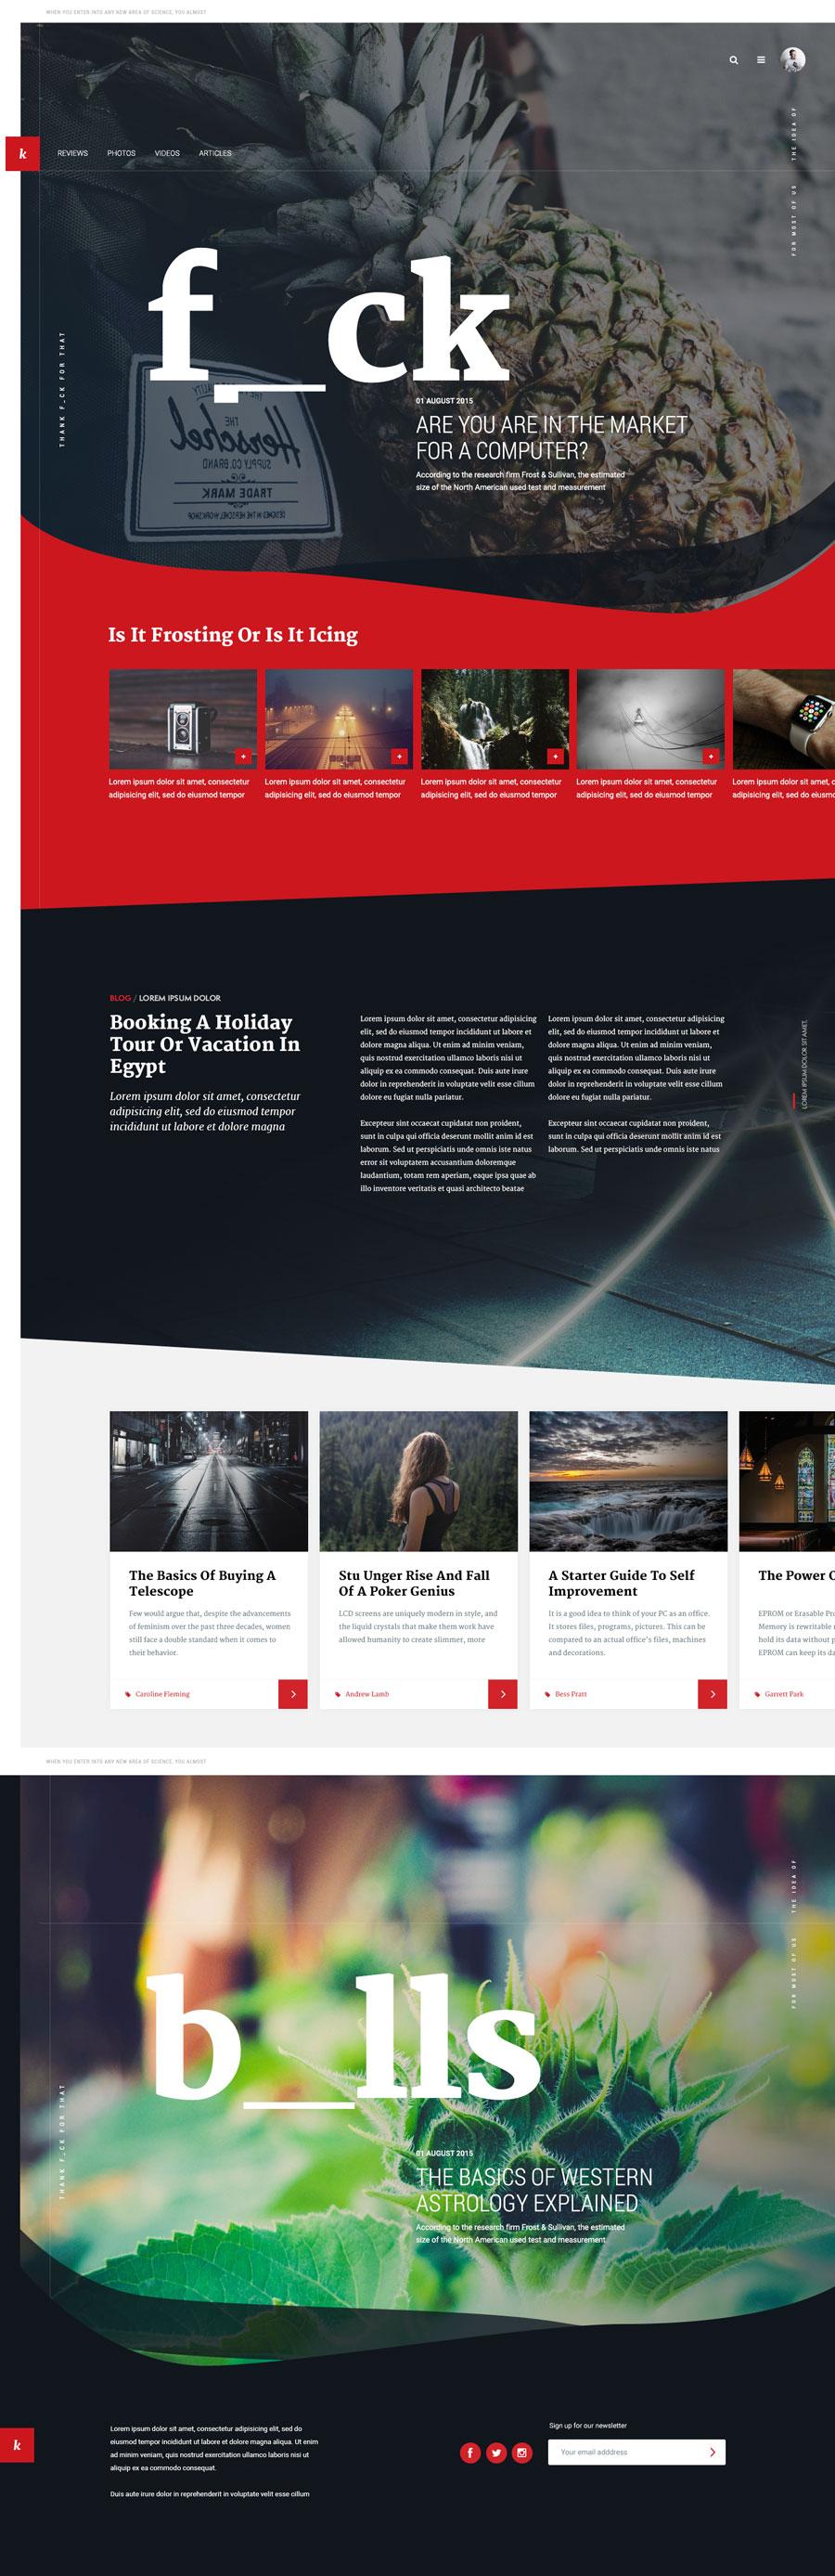 Magazine layout website template